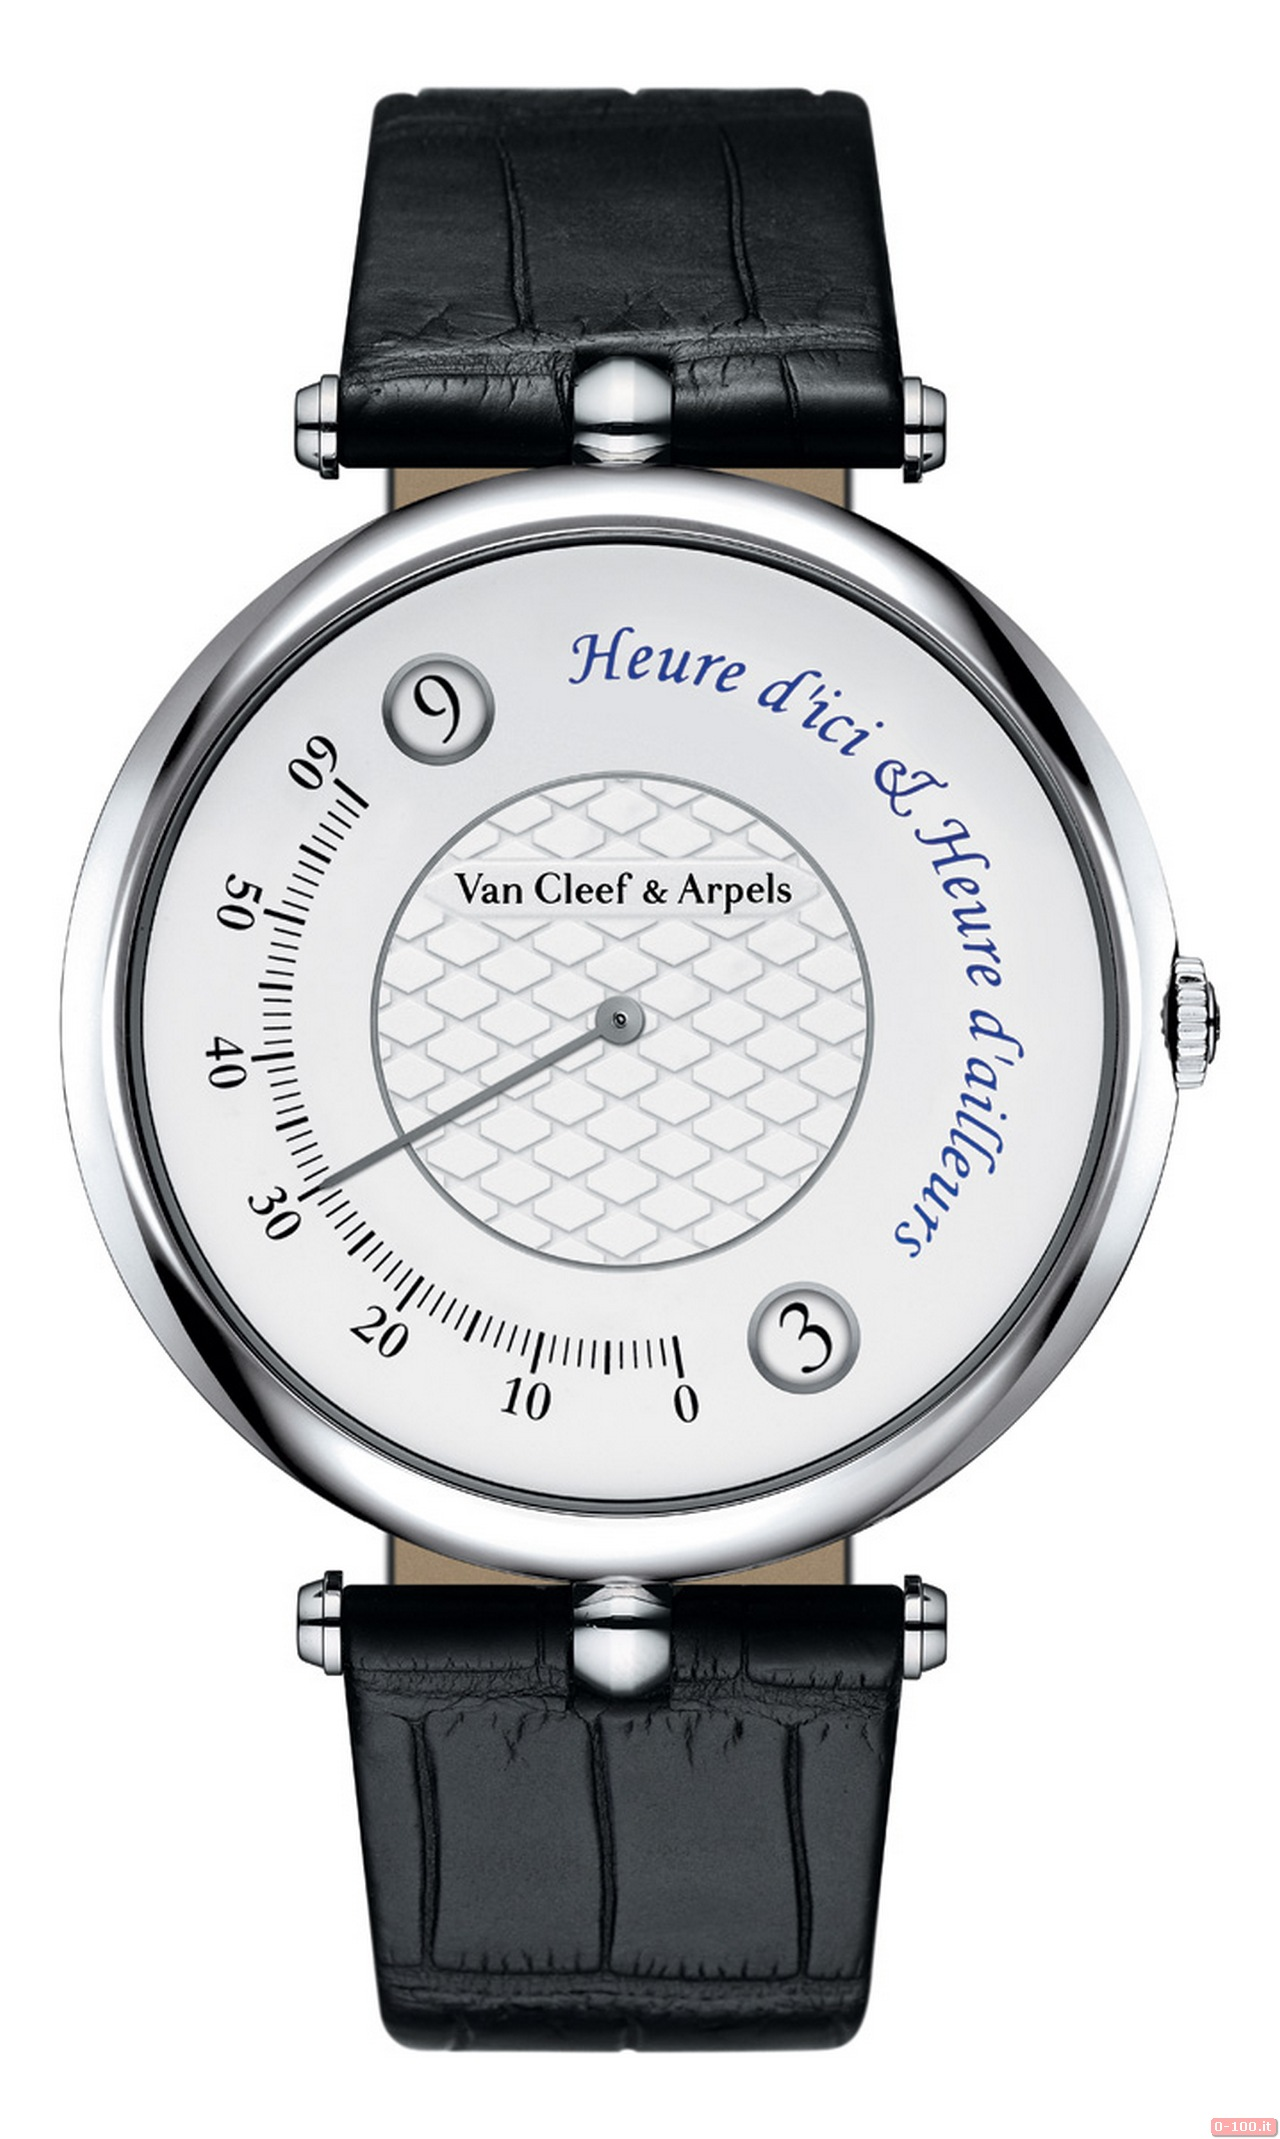 sihh-2014-van-cleef-arpels-heure-dici-heure-dailleurs-prezzo-price_0-1001